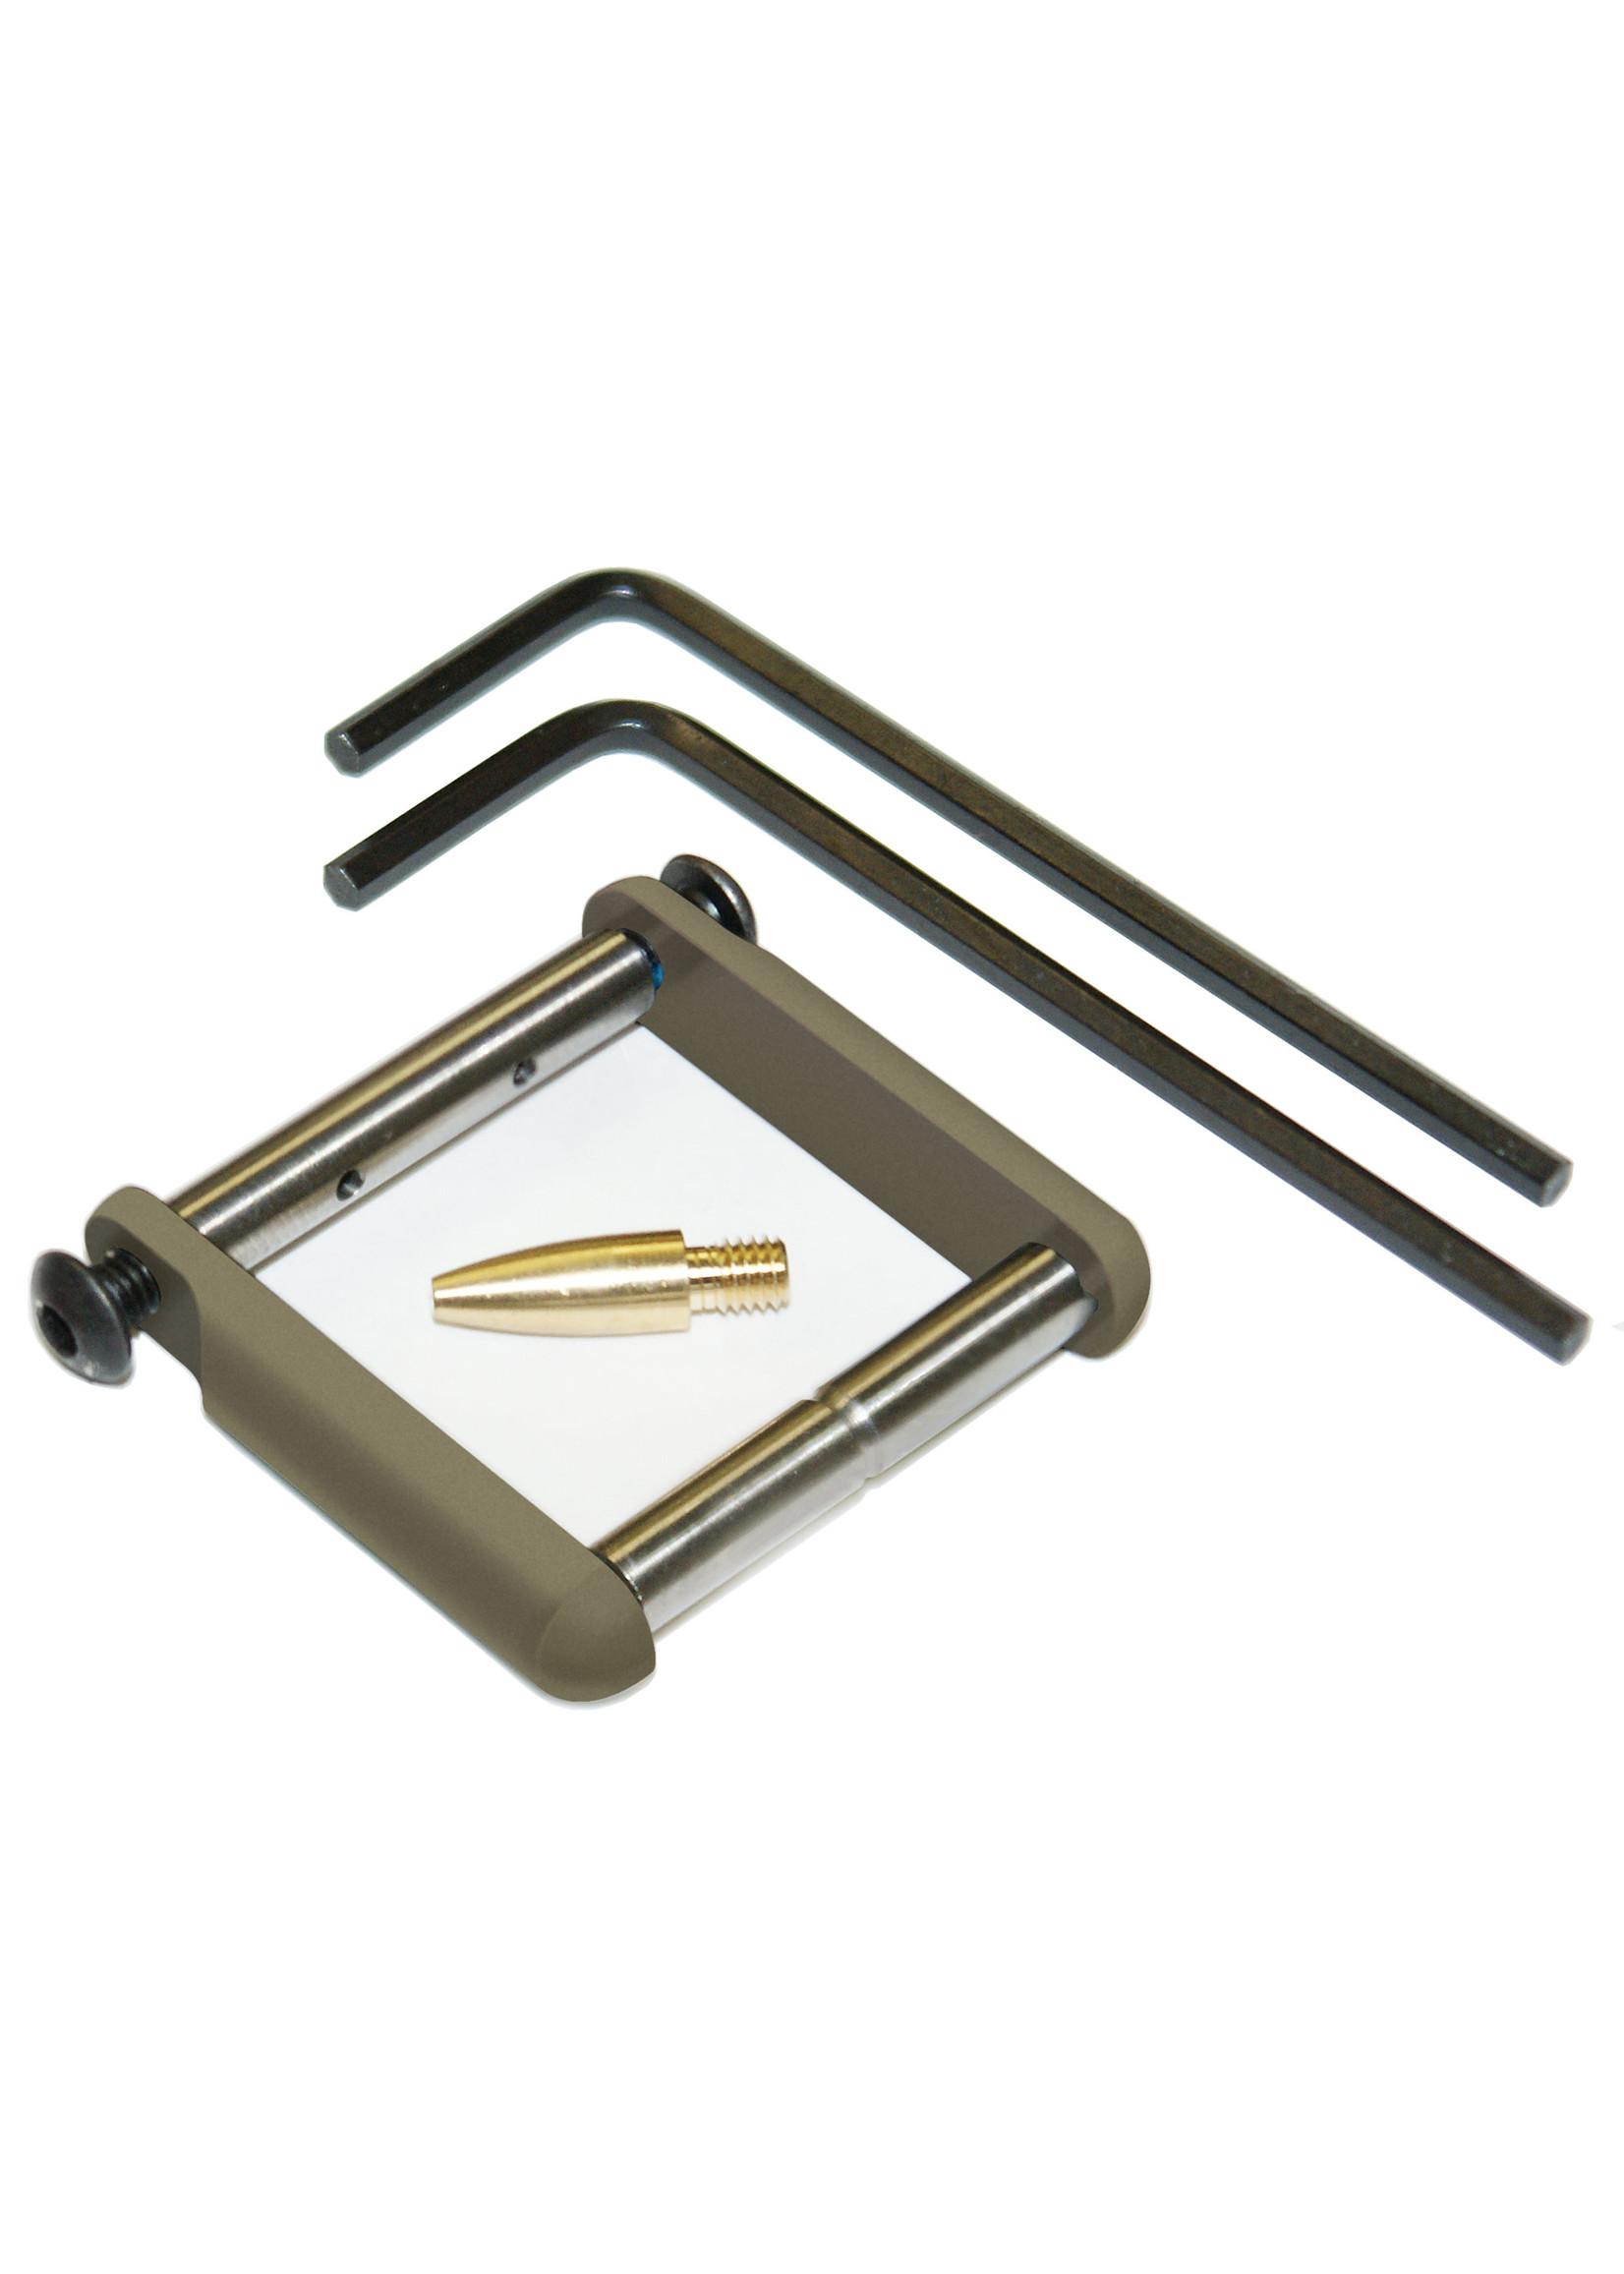 KNS Precision, Inc. KNS Precision Hammer and Trigger Pin Non Rotating AR-15 Small Pin .154 Inch FDE